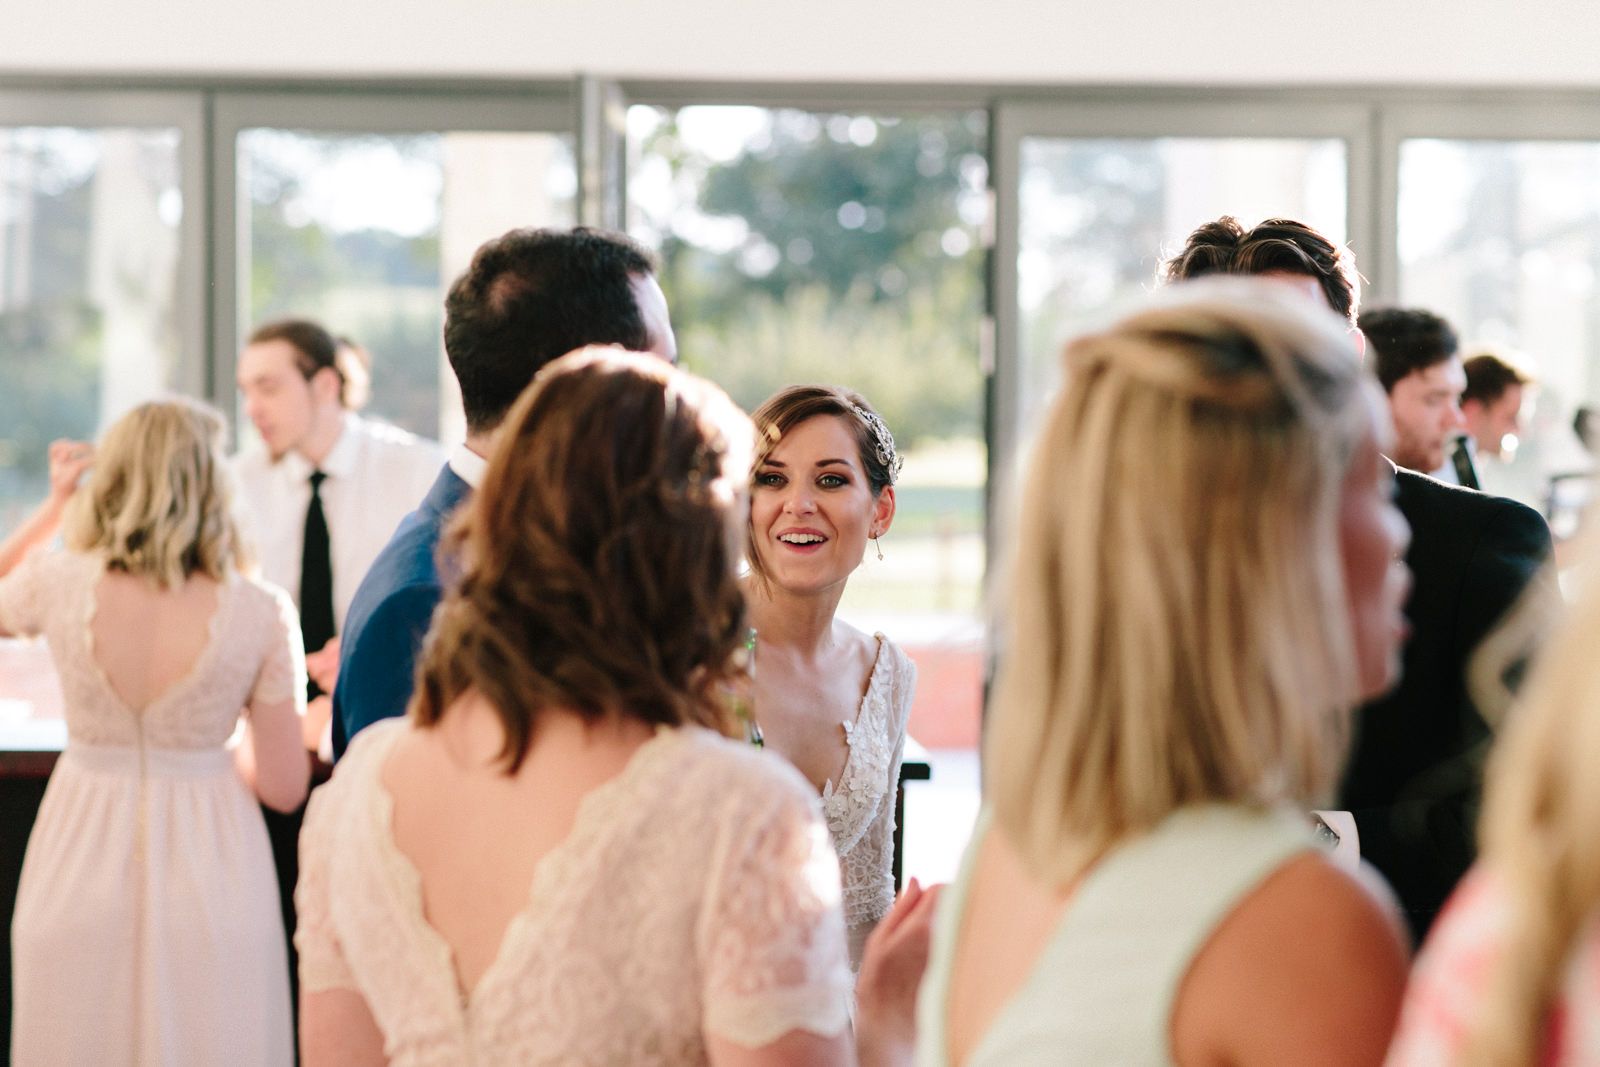 Stanbrooke Abbey Wedding Photographer-310161.jpg